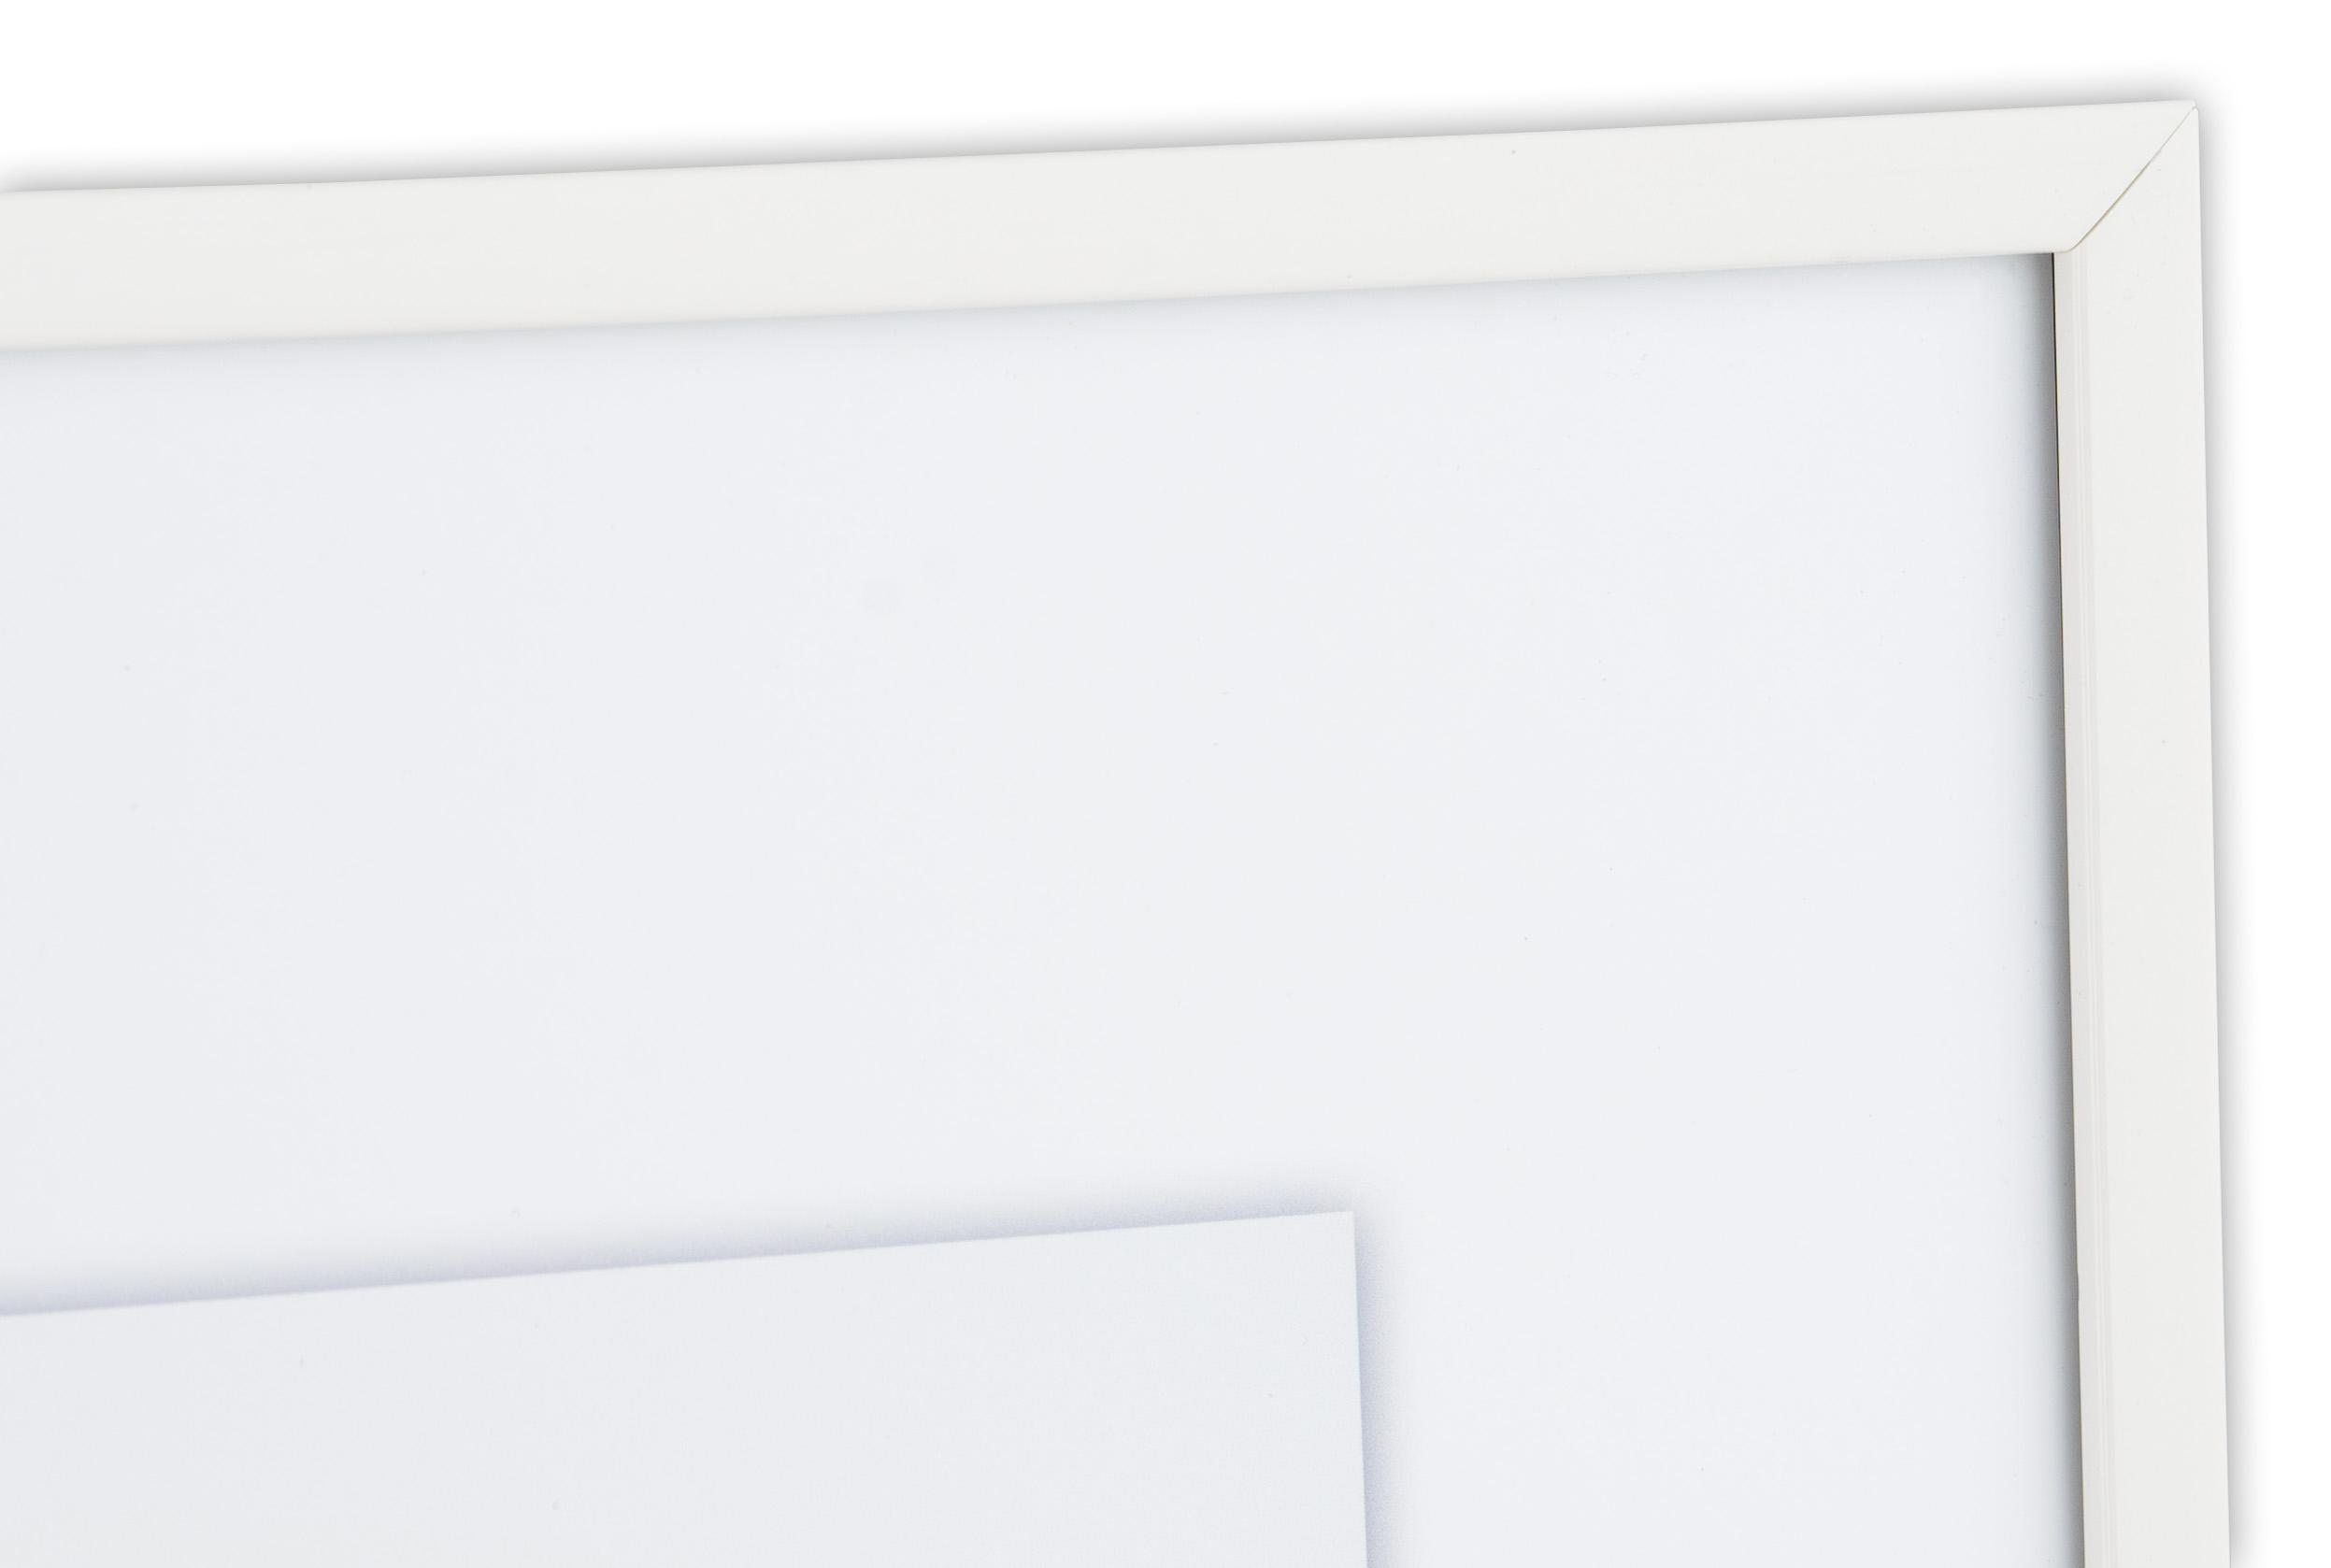 hvide rammer 70x100